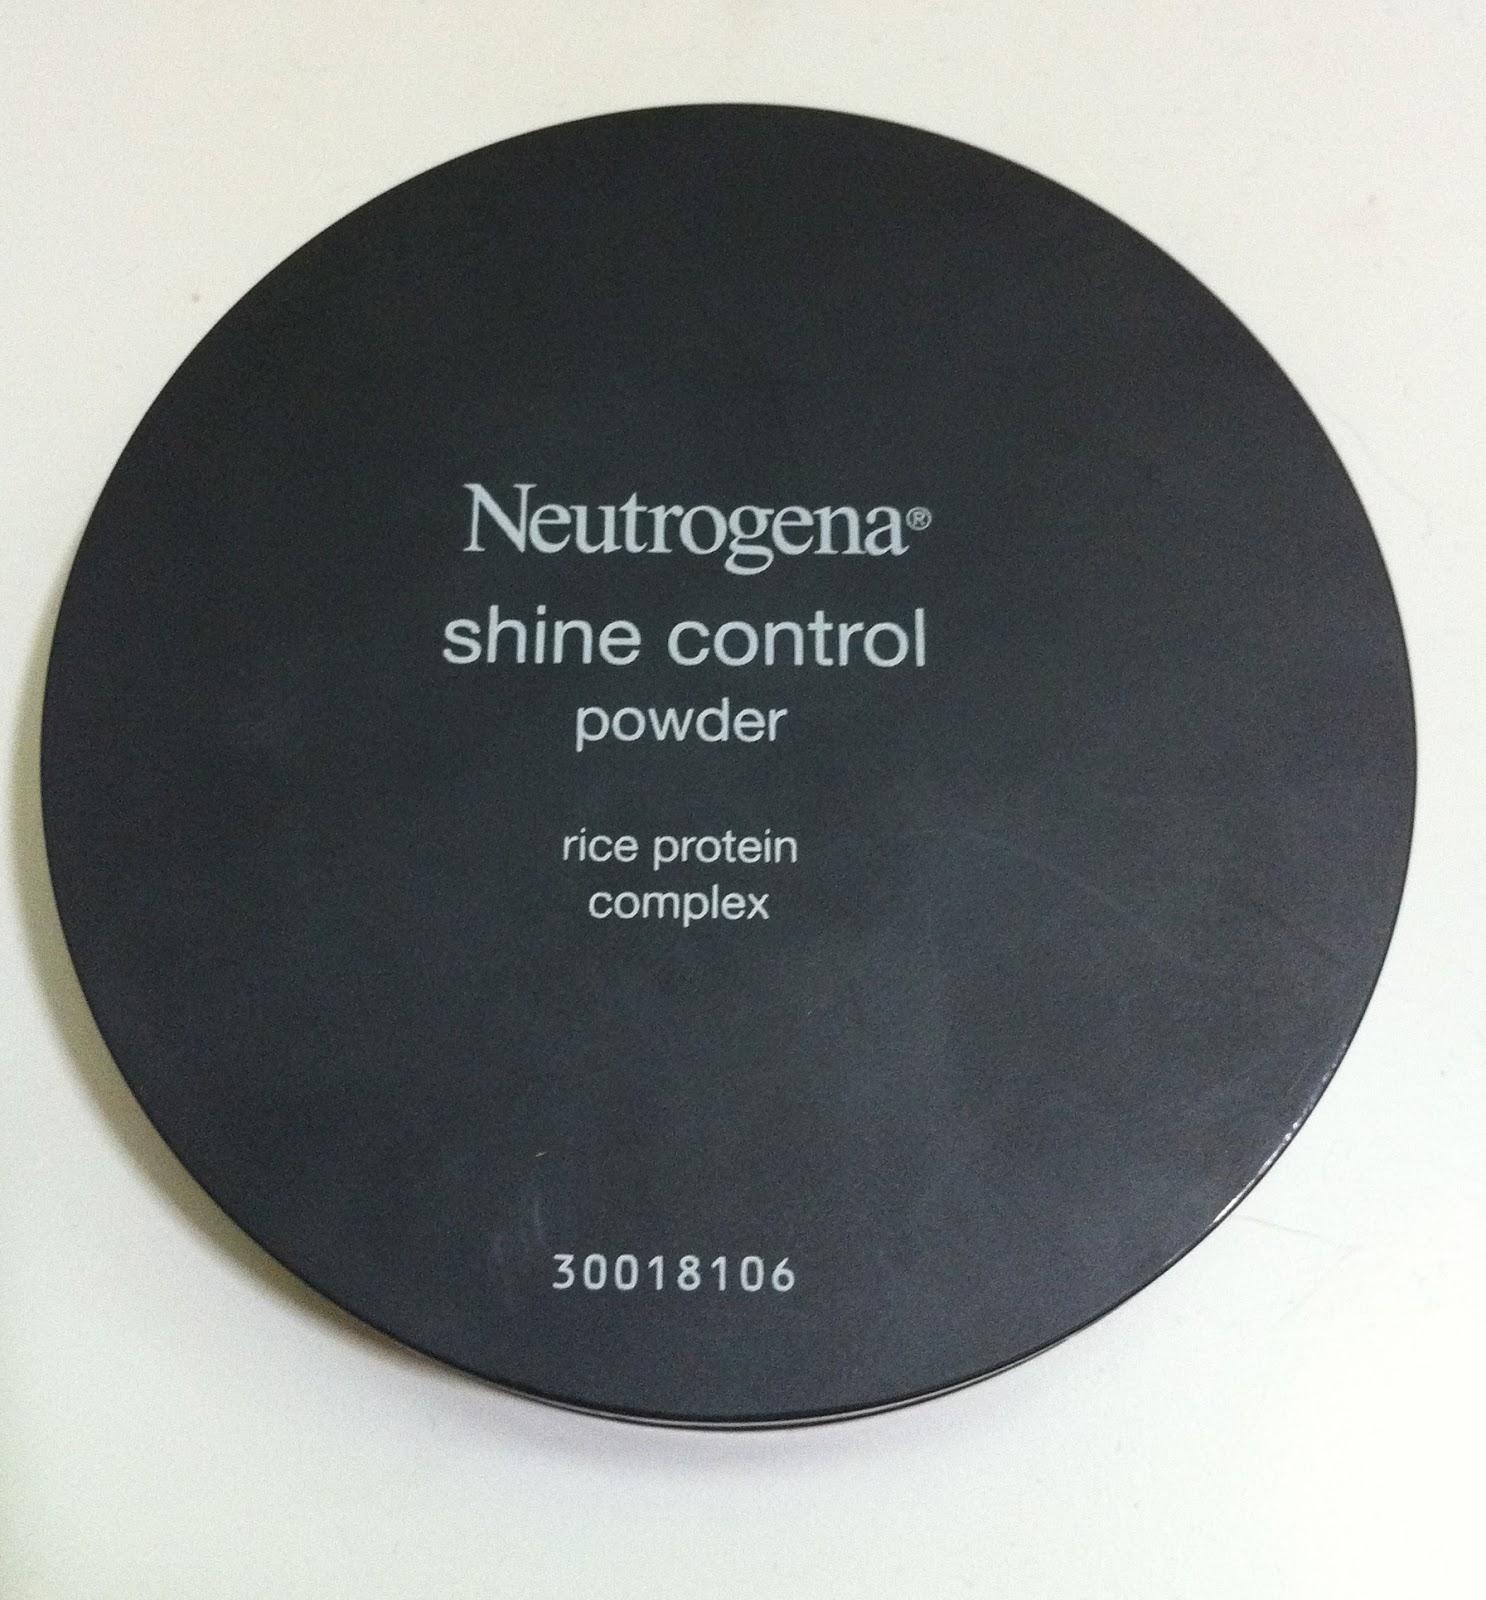 Neutrogena rice protein powder